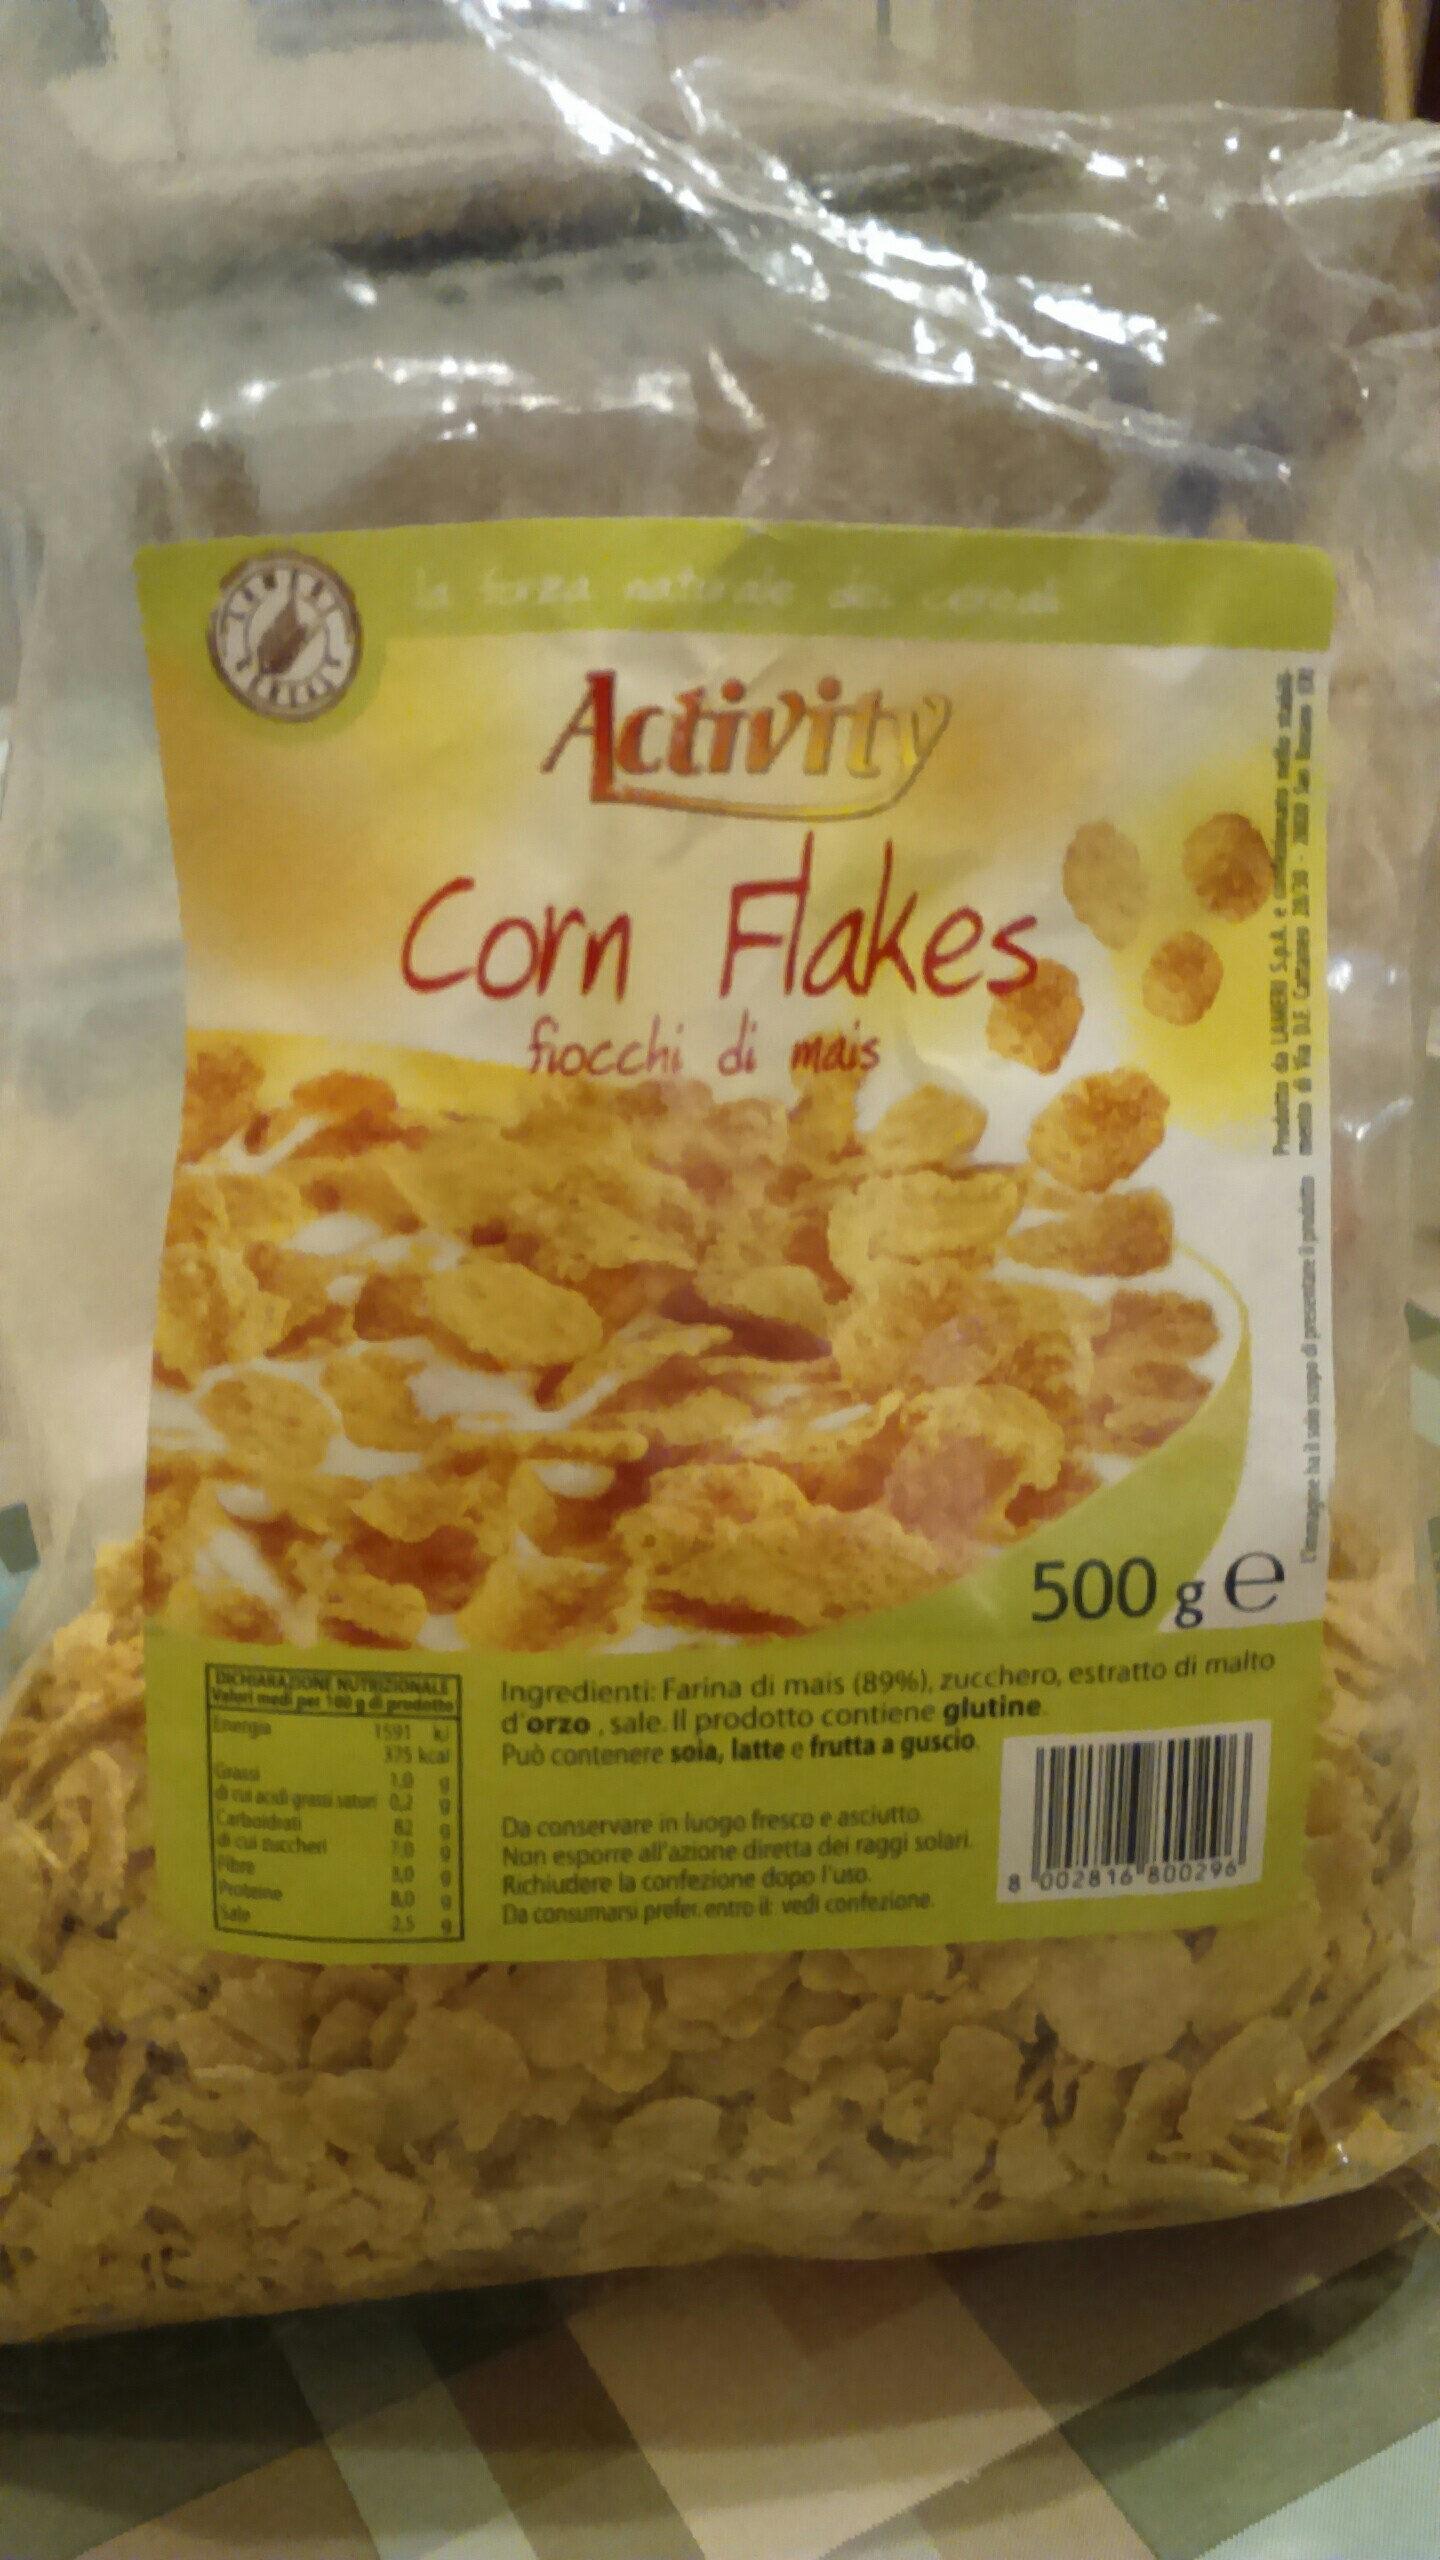 Activity Corn Flakes - Product - it